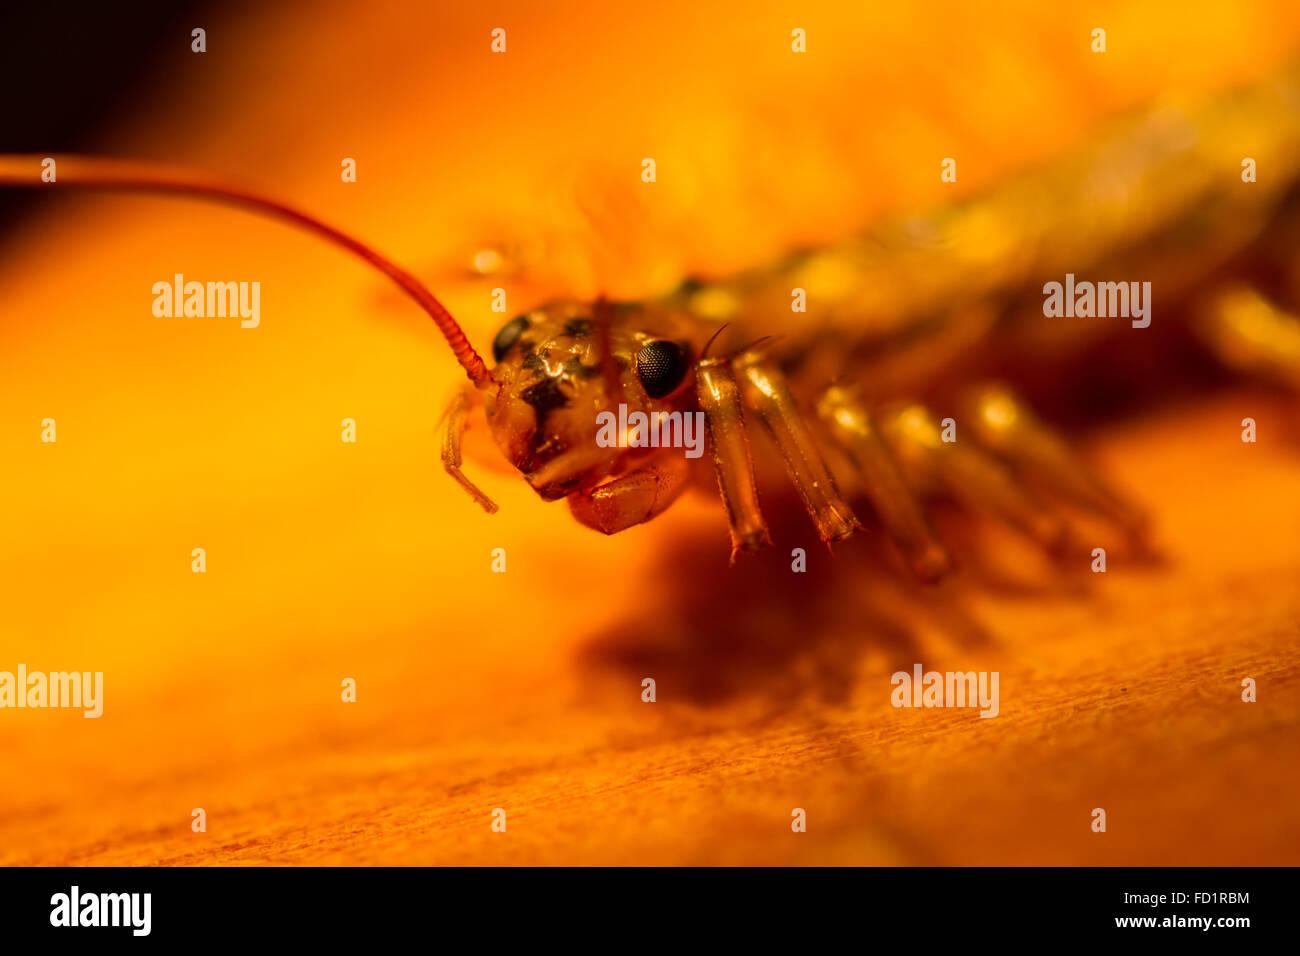 silverfish head peering - Stock Image